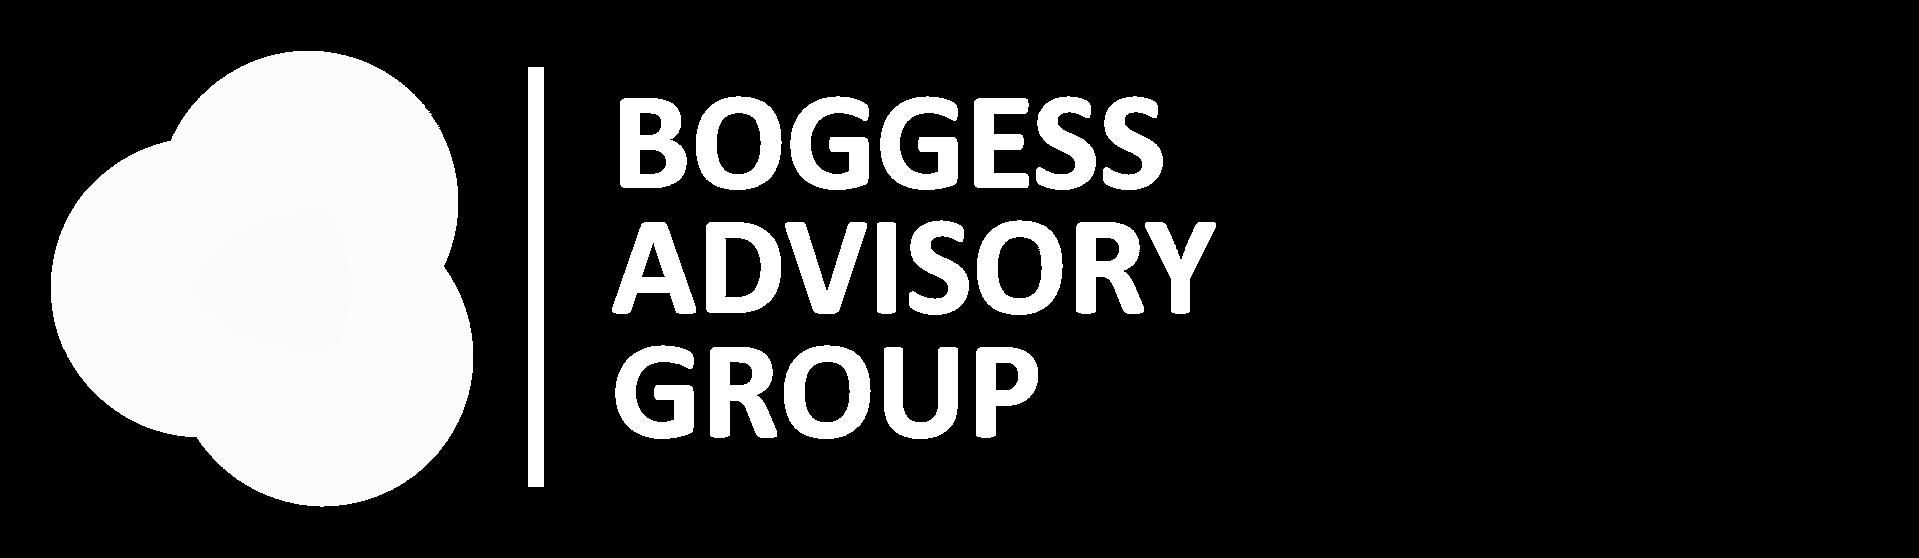 Boggess Advisory Group